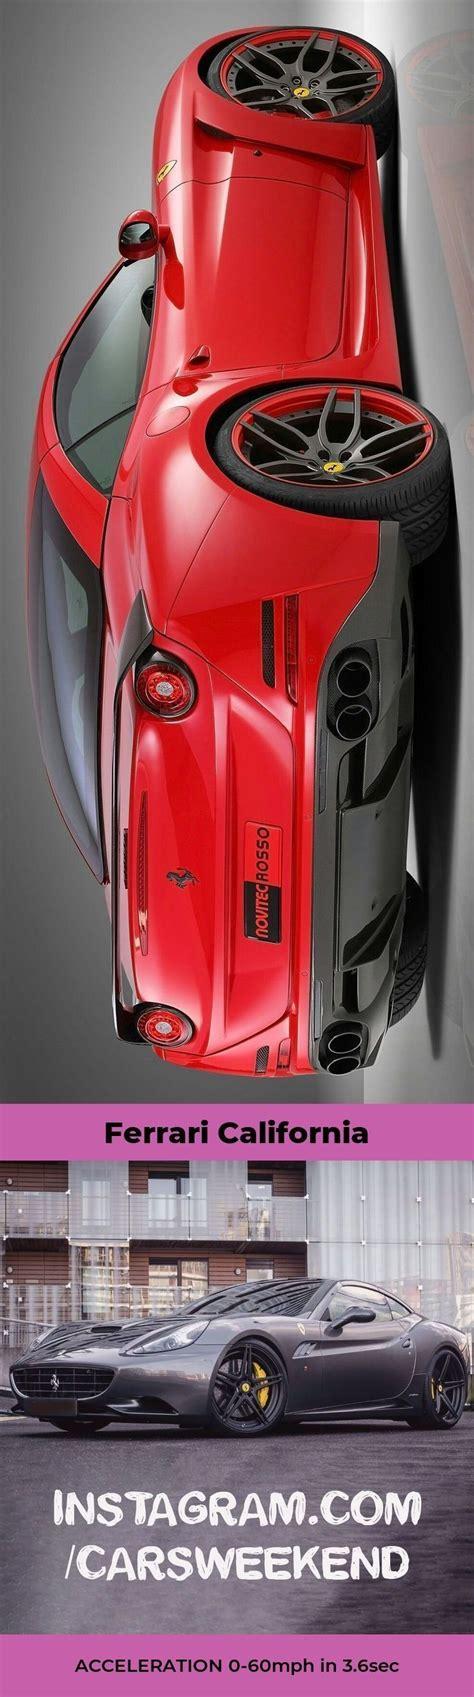 The ferrari california t with the top up. The Ferrari California TOP SPEED 196mph #ferraricaliforniat   Carros importados, Carros